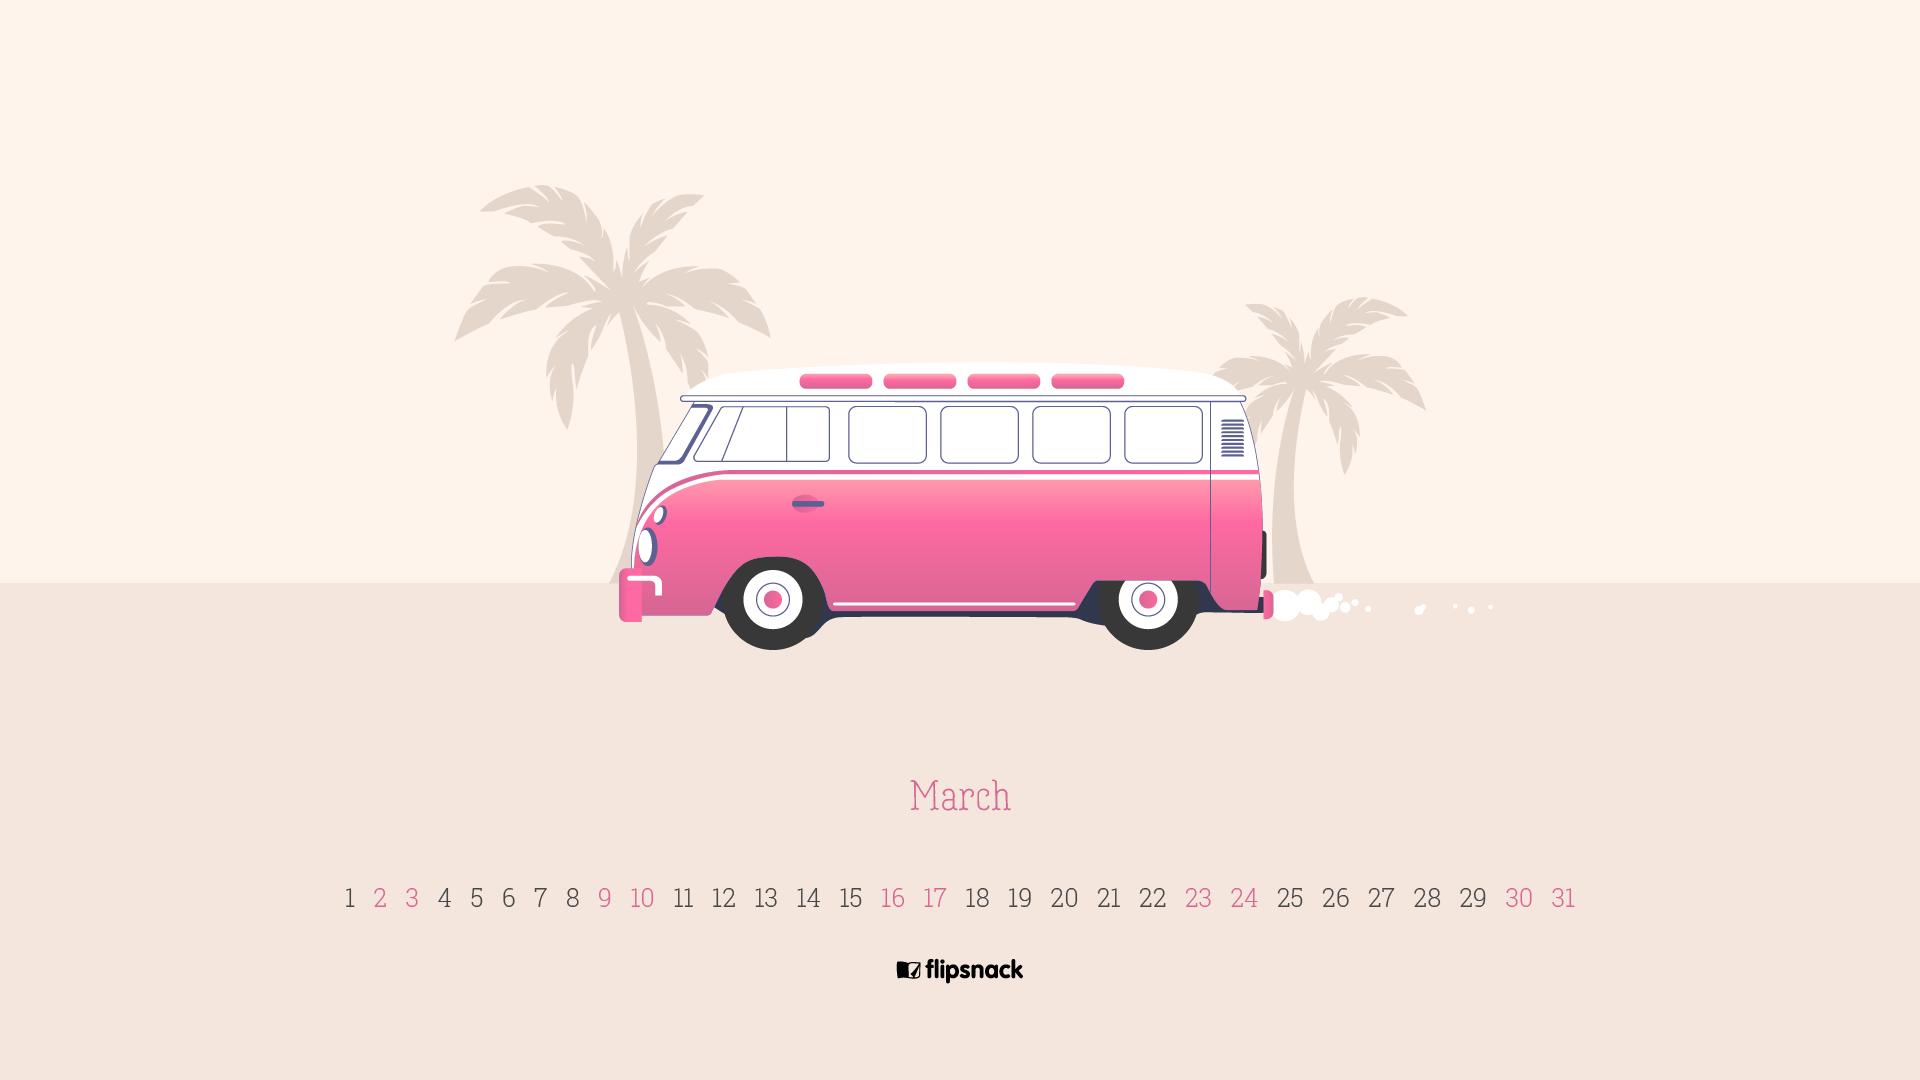 March 2019 wallpaper calendars   Flipsnack Blog 1920x1080